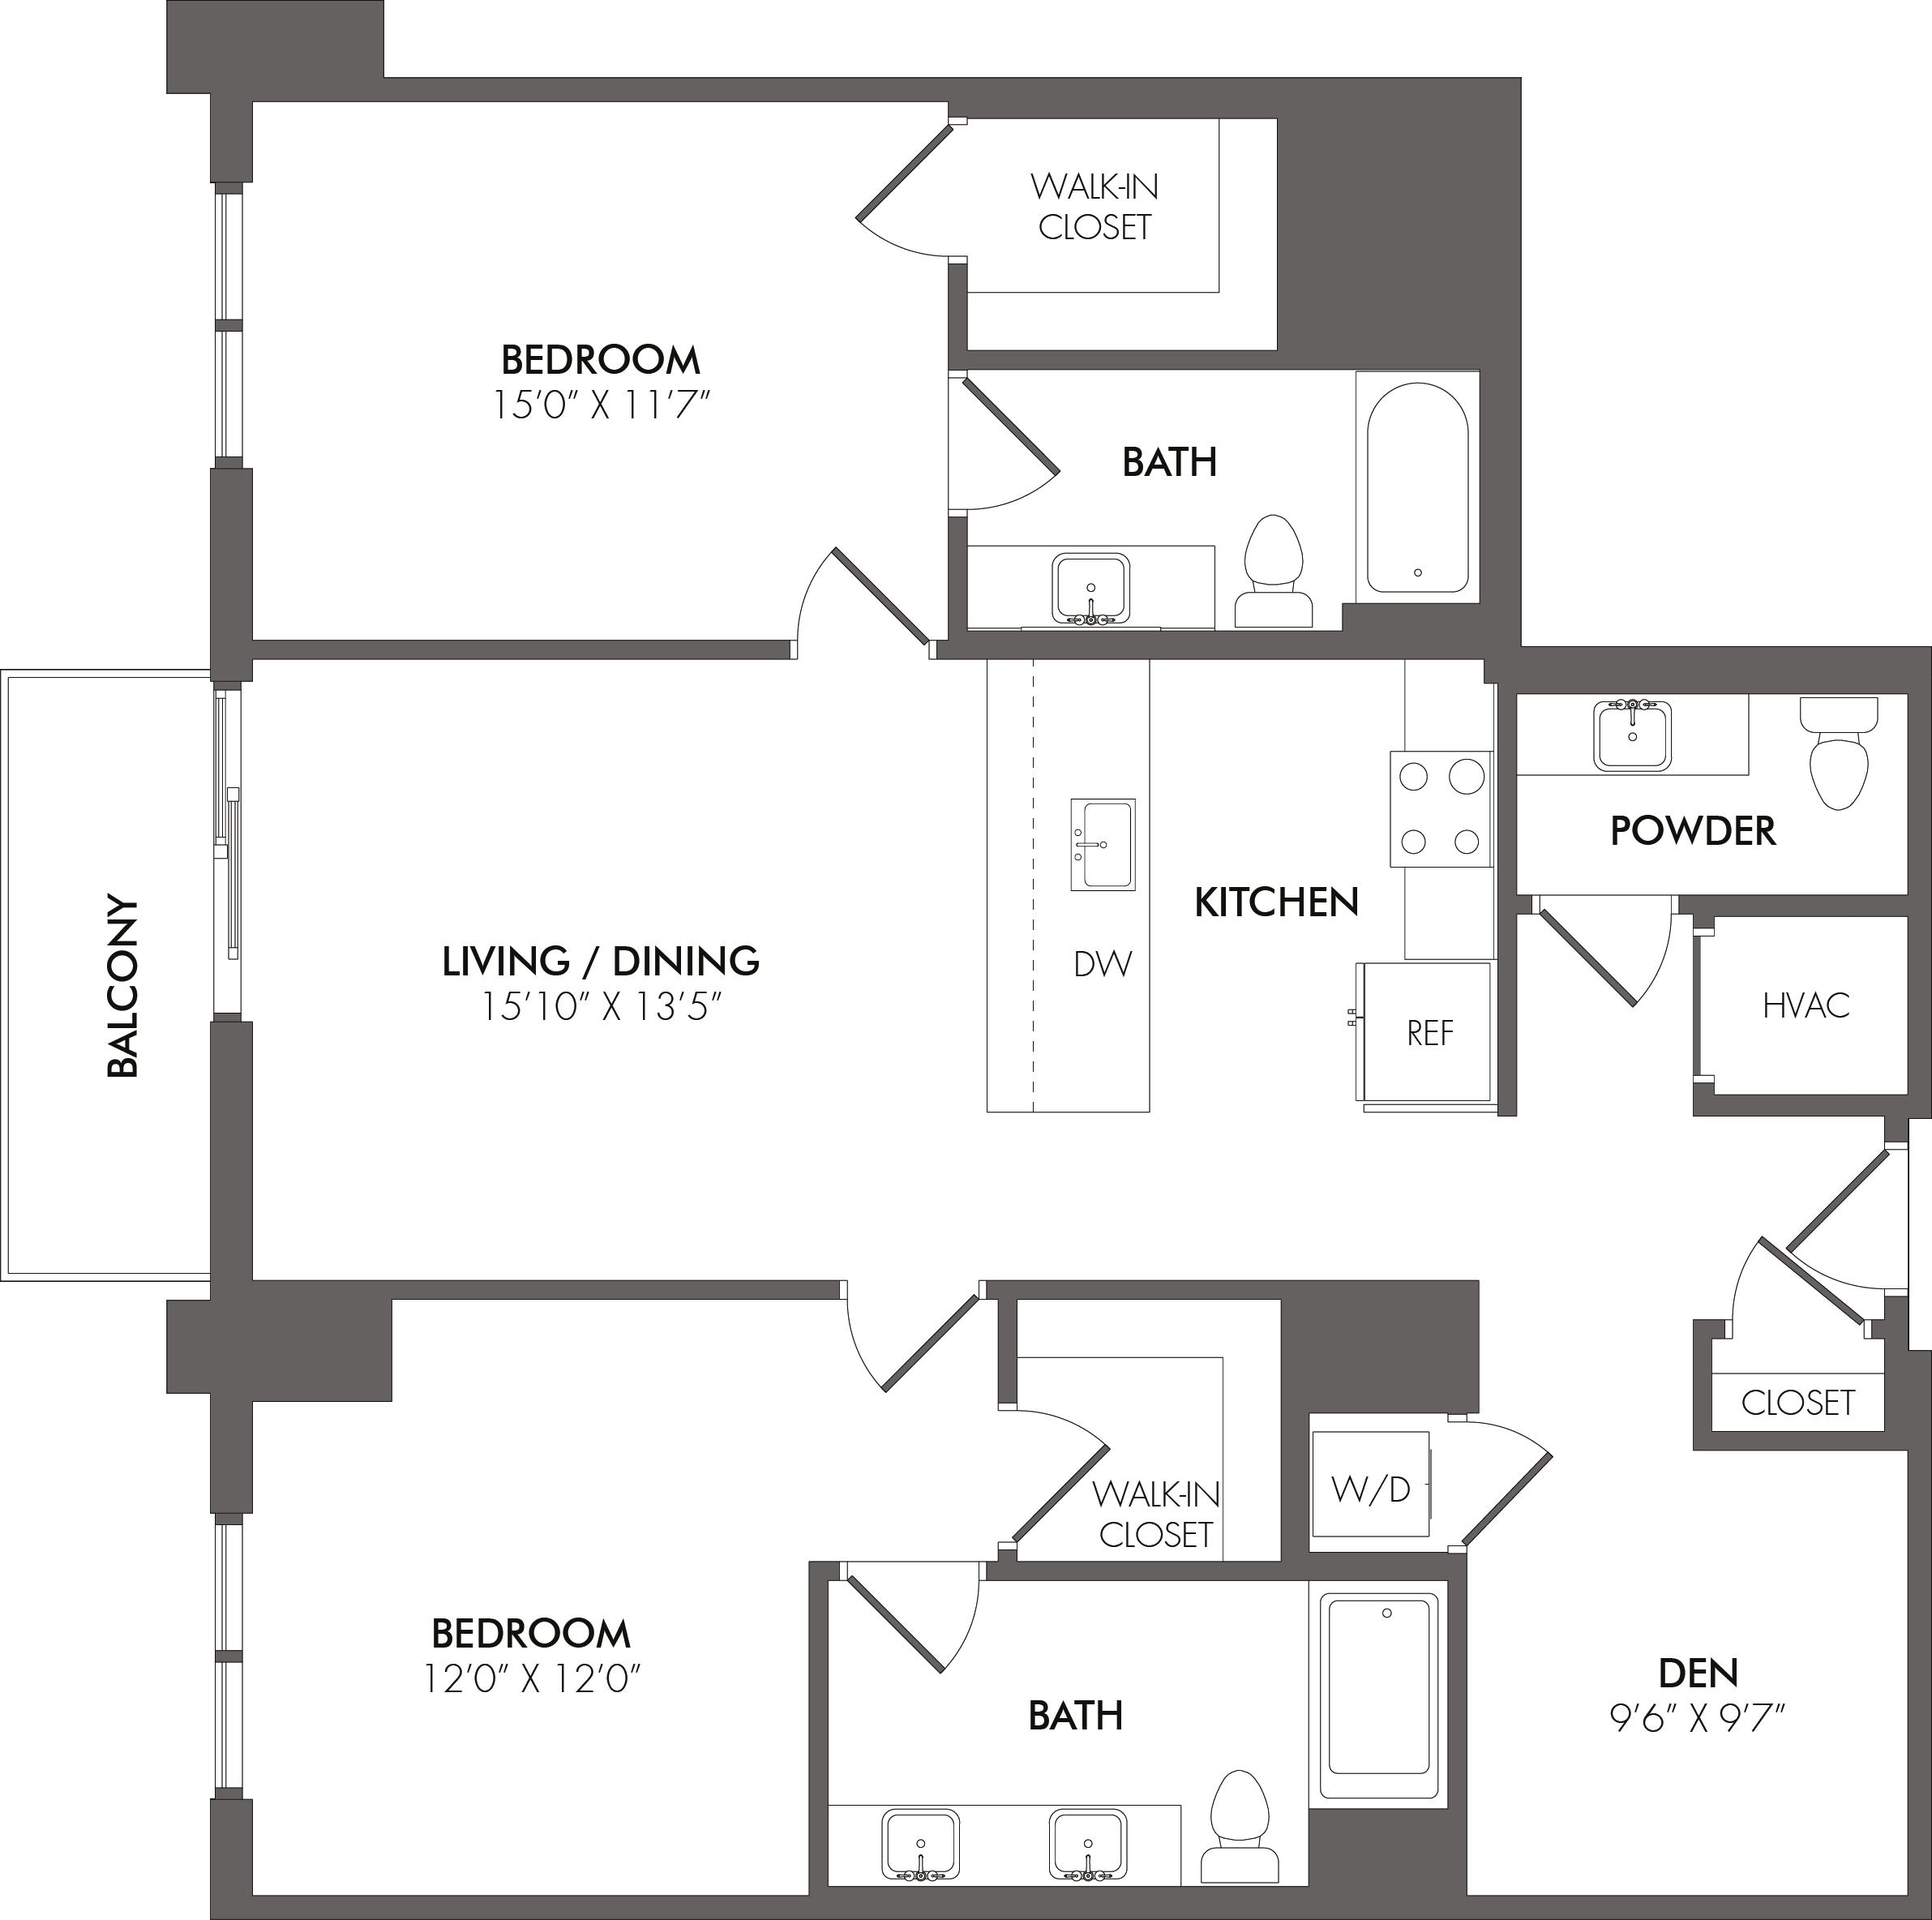 Apartment 4106 floorplan